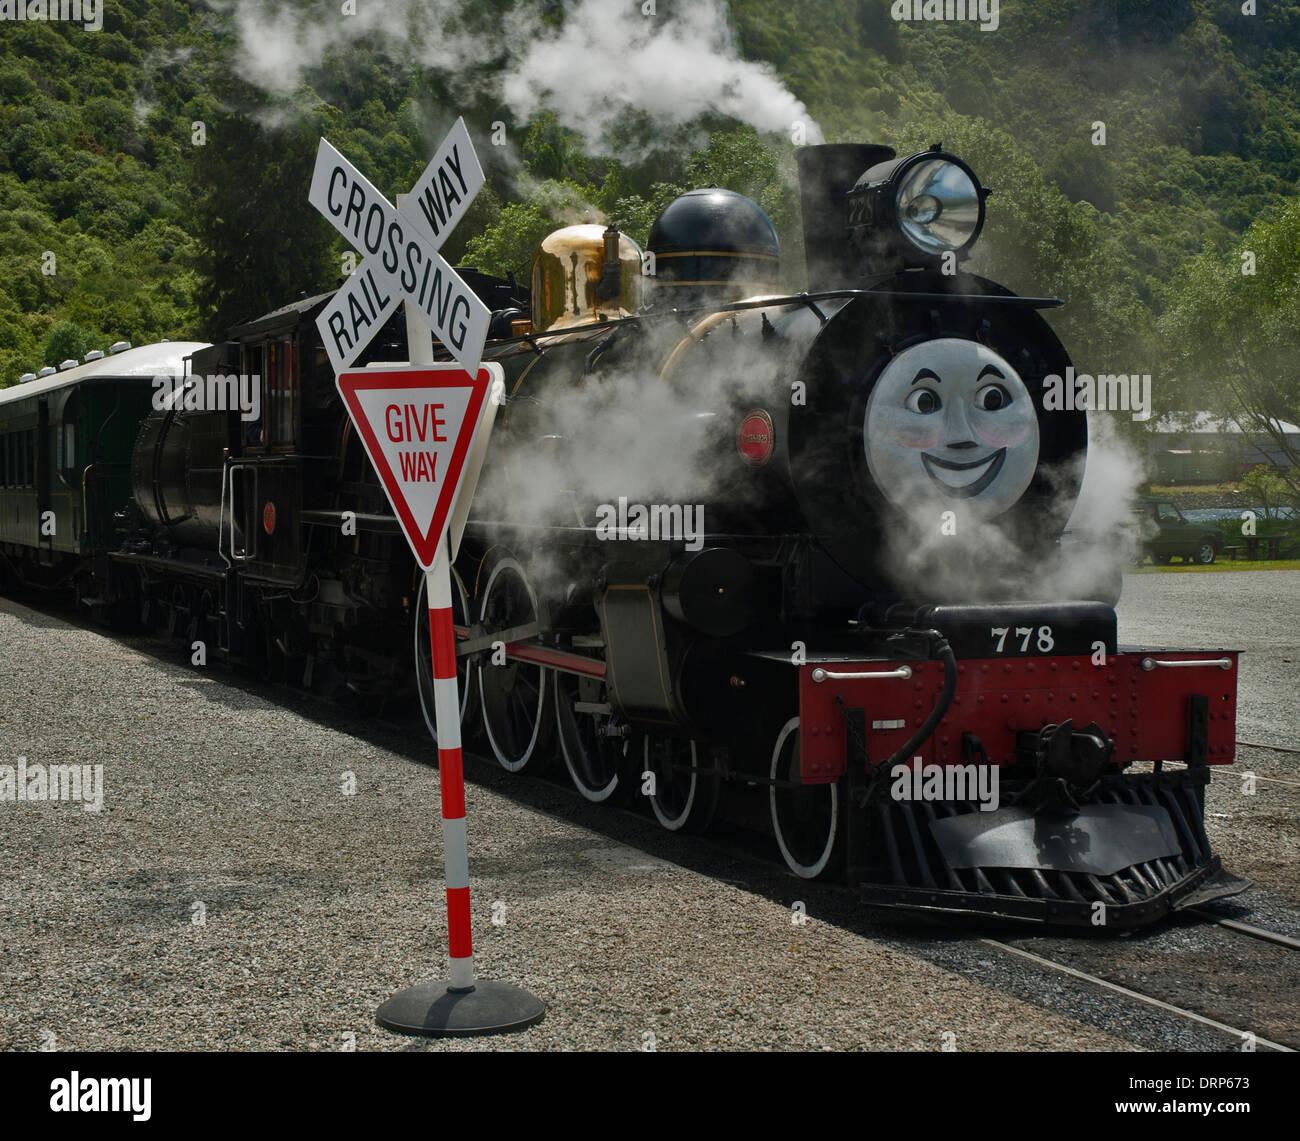 File:Steam Locomotive.New Hope.NJ.jpg - Wikimedia Commons